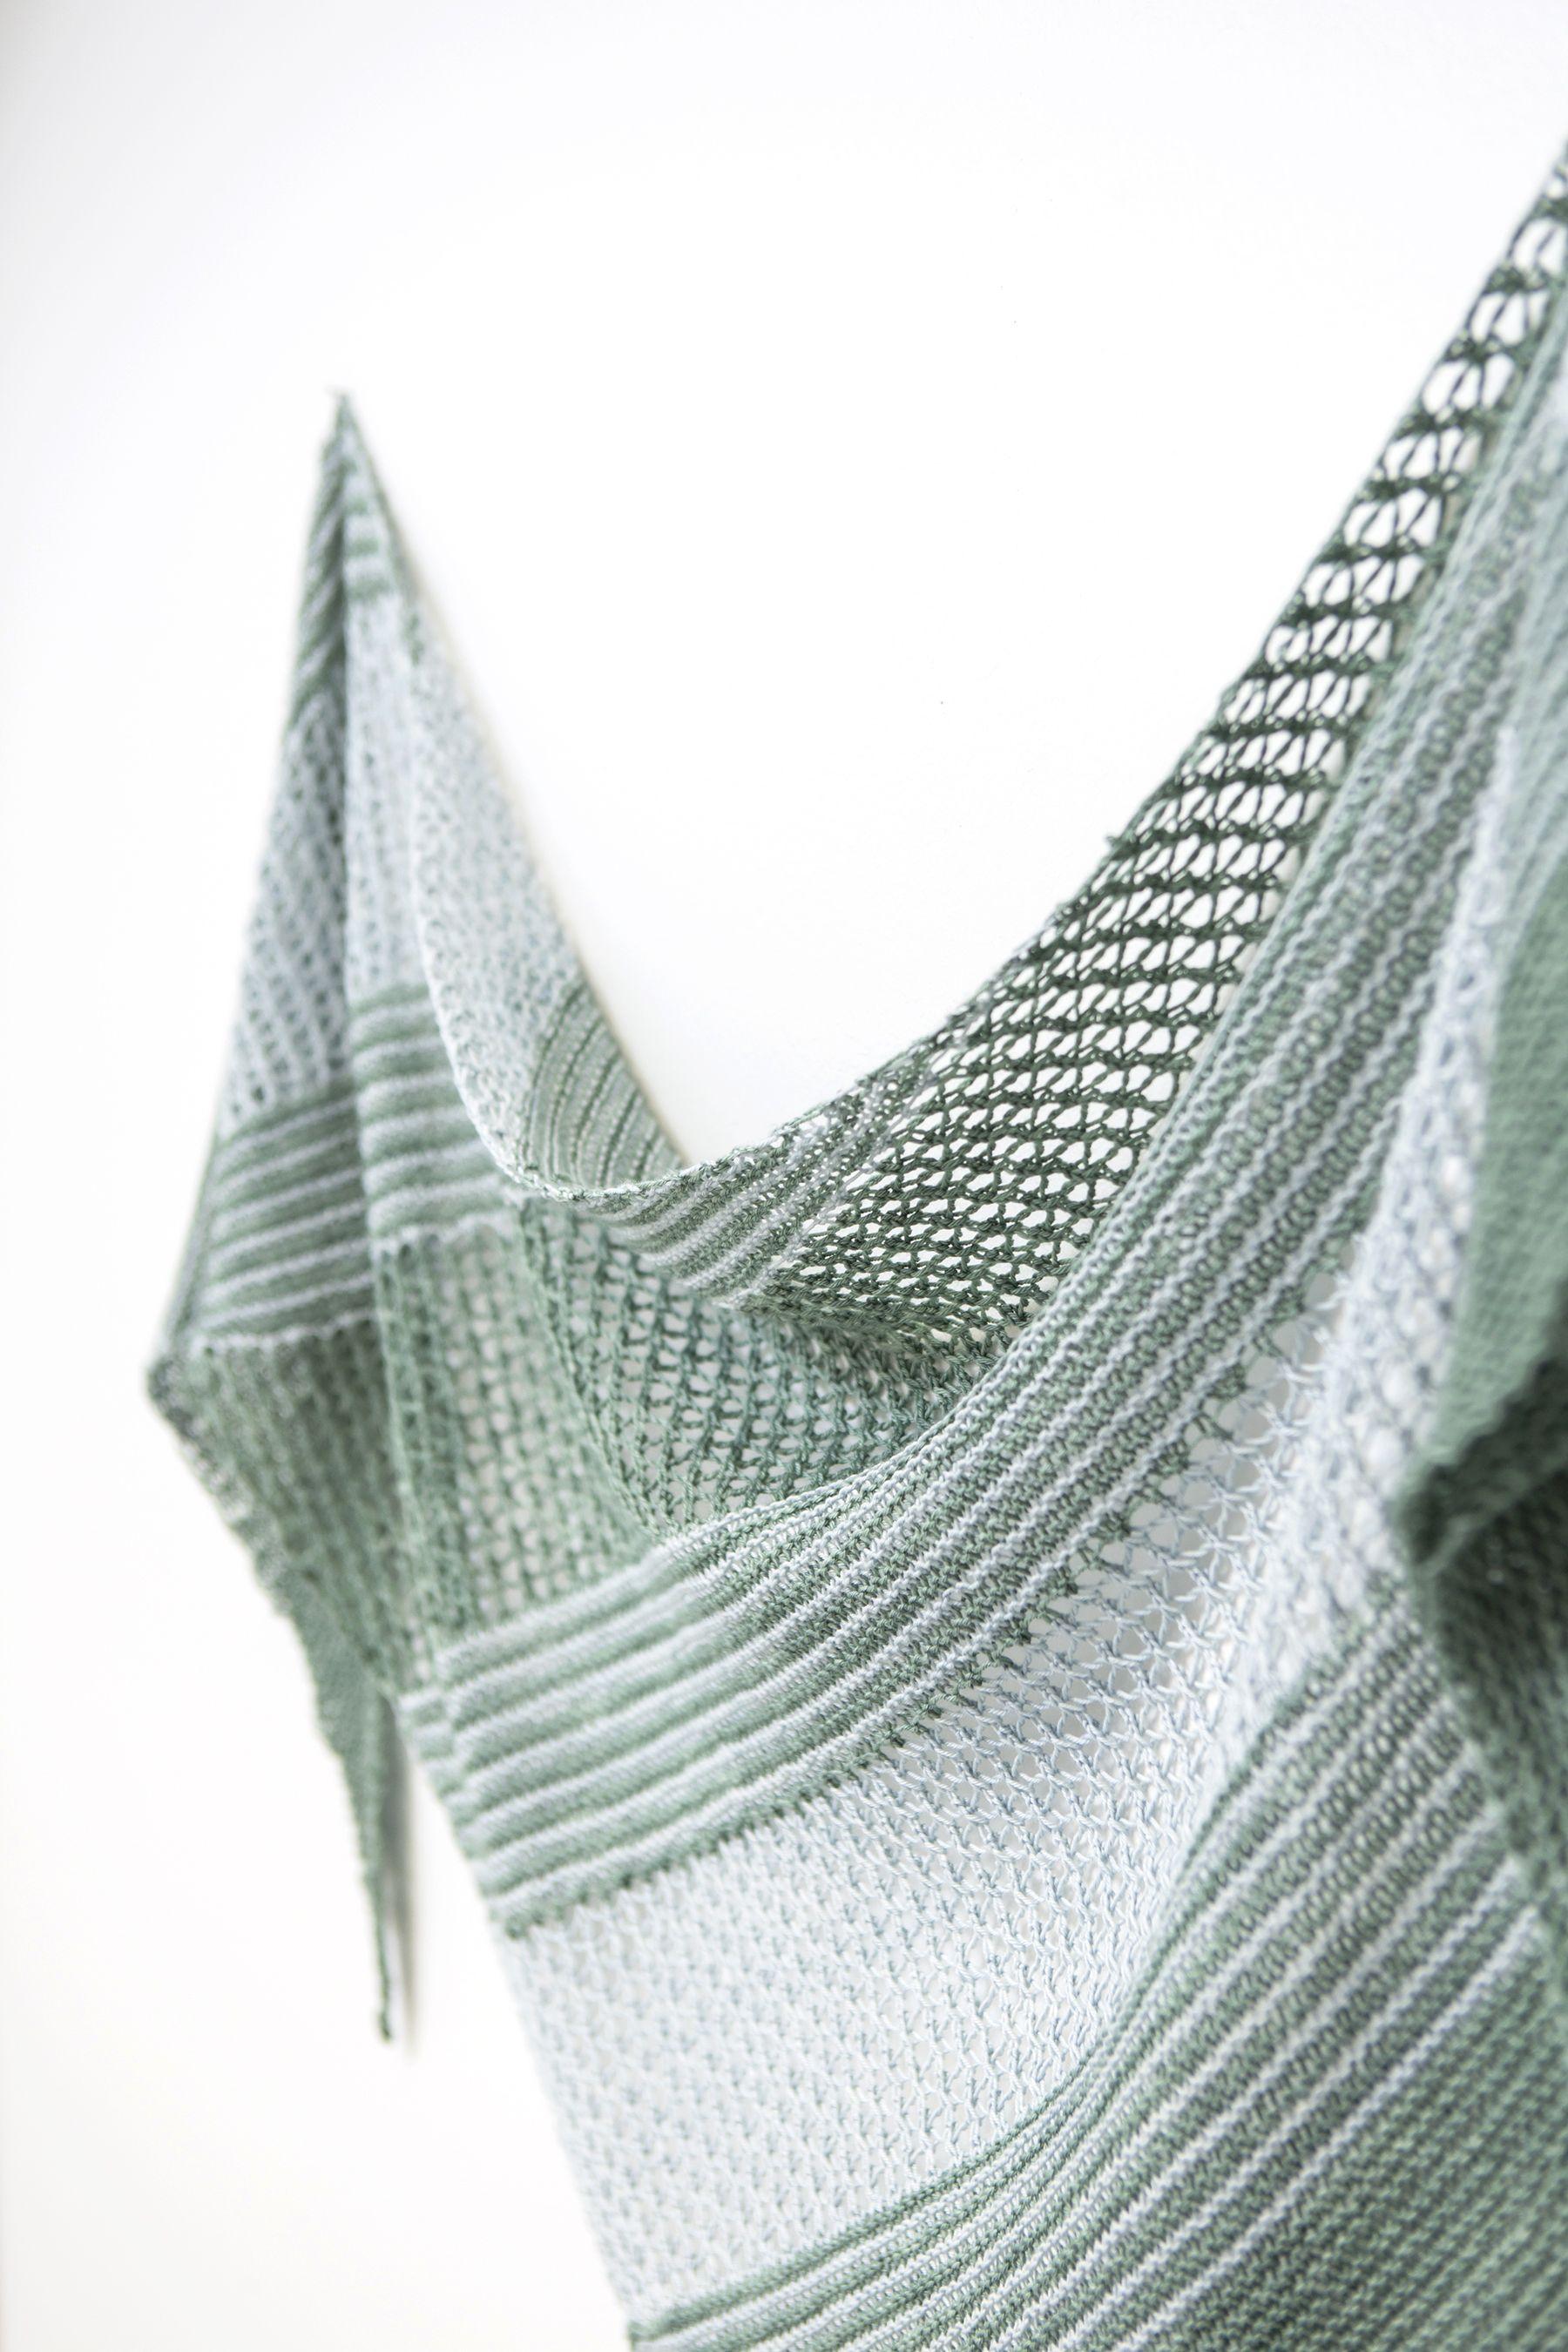 Sea grass pattern by janina kallio finger knitting knit ravelry sea grass shawl with dyeforyarn merinosilk fingering knitting pattern by janina bankloansurffo Gallery